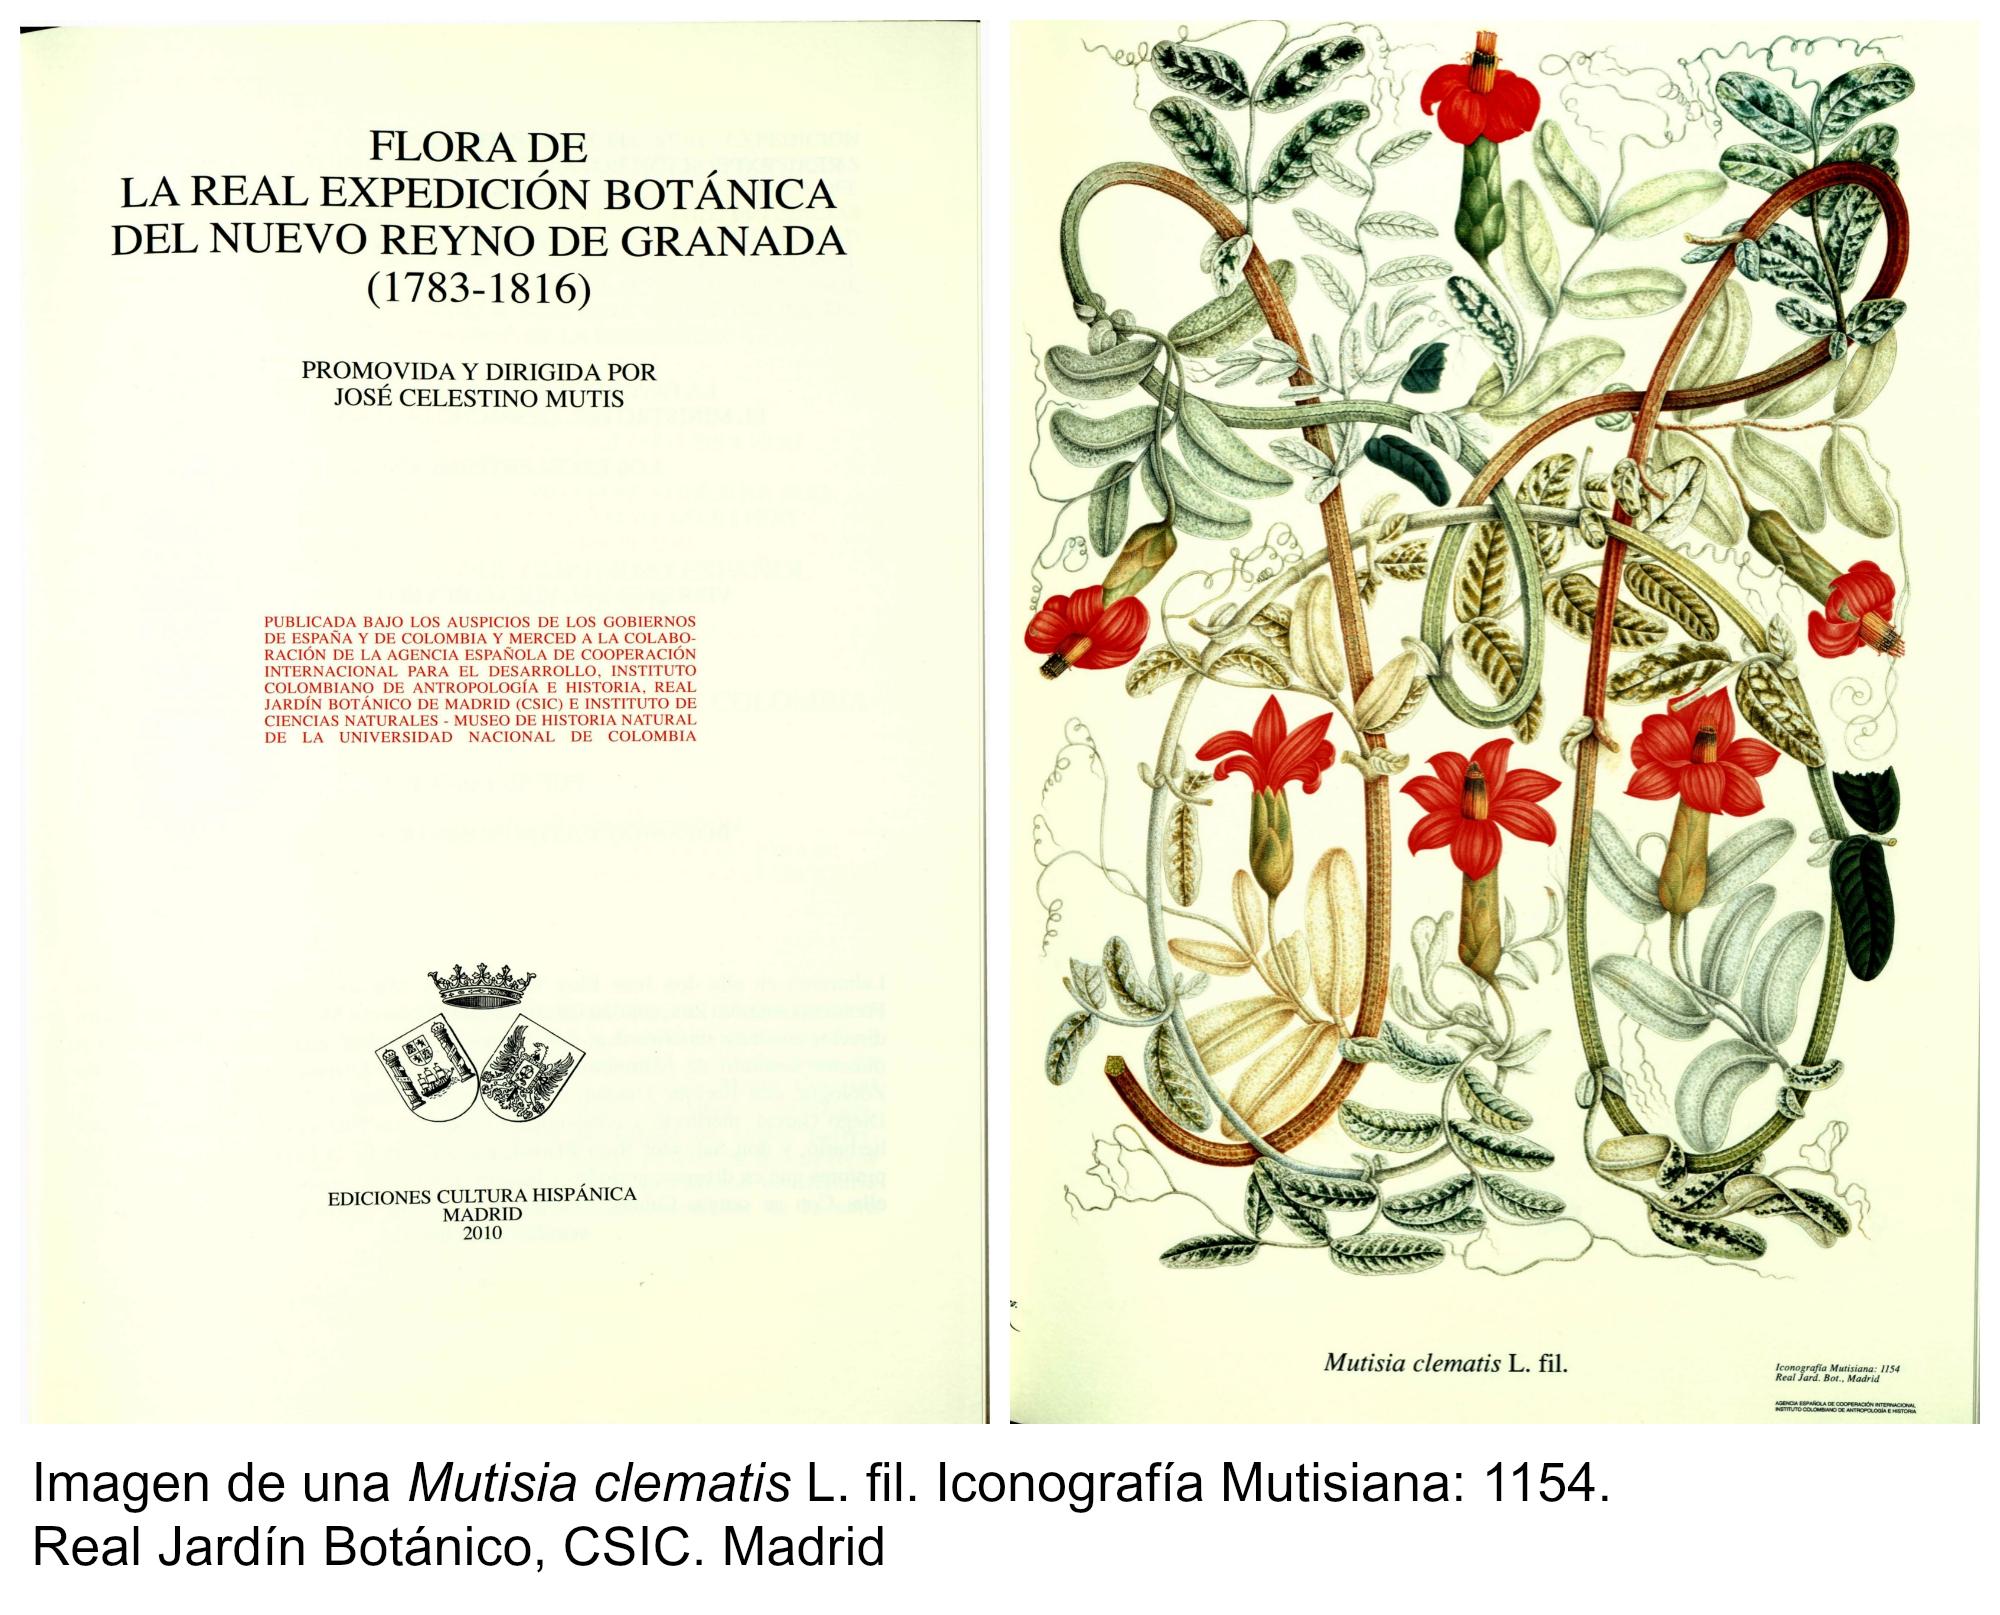 Real expedici pn bot nica de la nueva espa a for Libros de botanica pdf